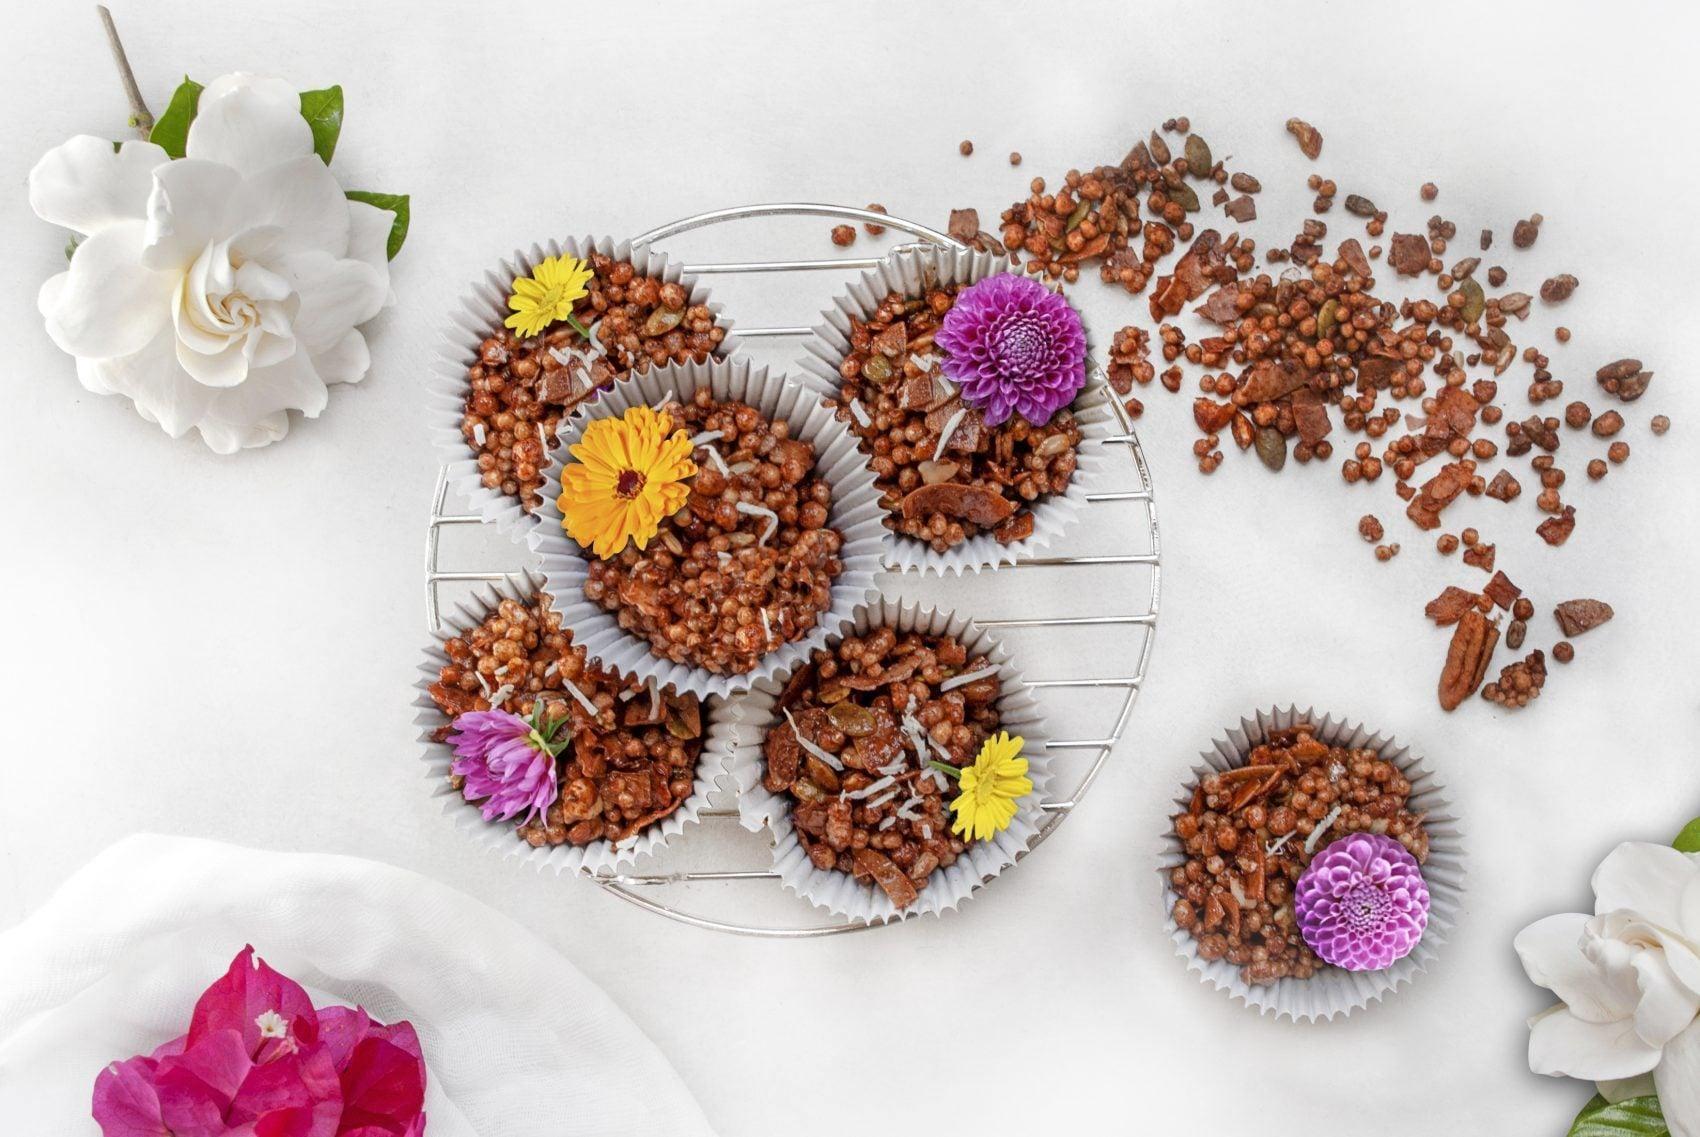 Cacao & Coconut Granola Bites